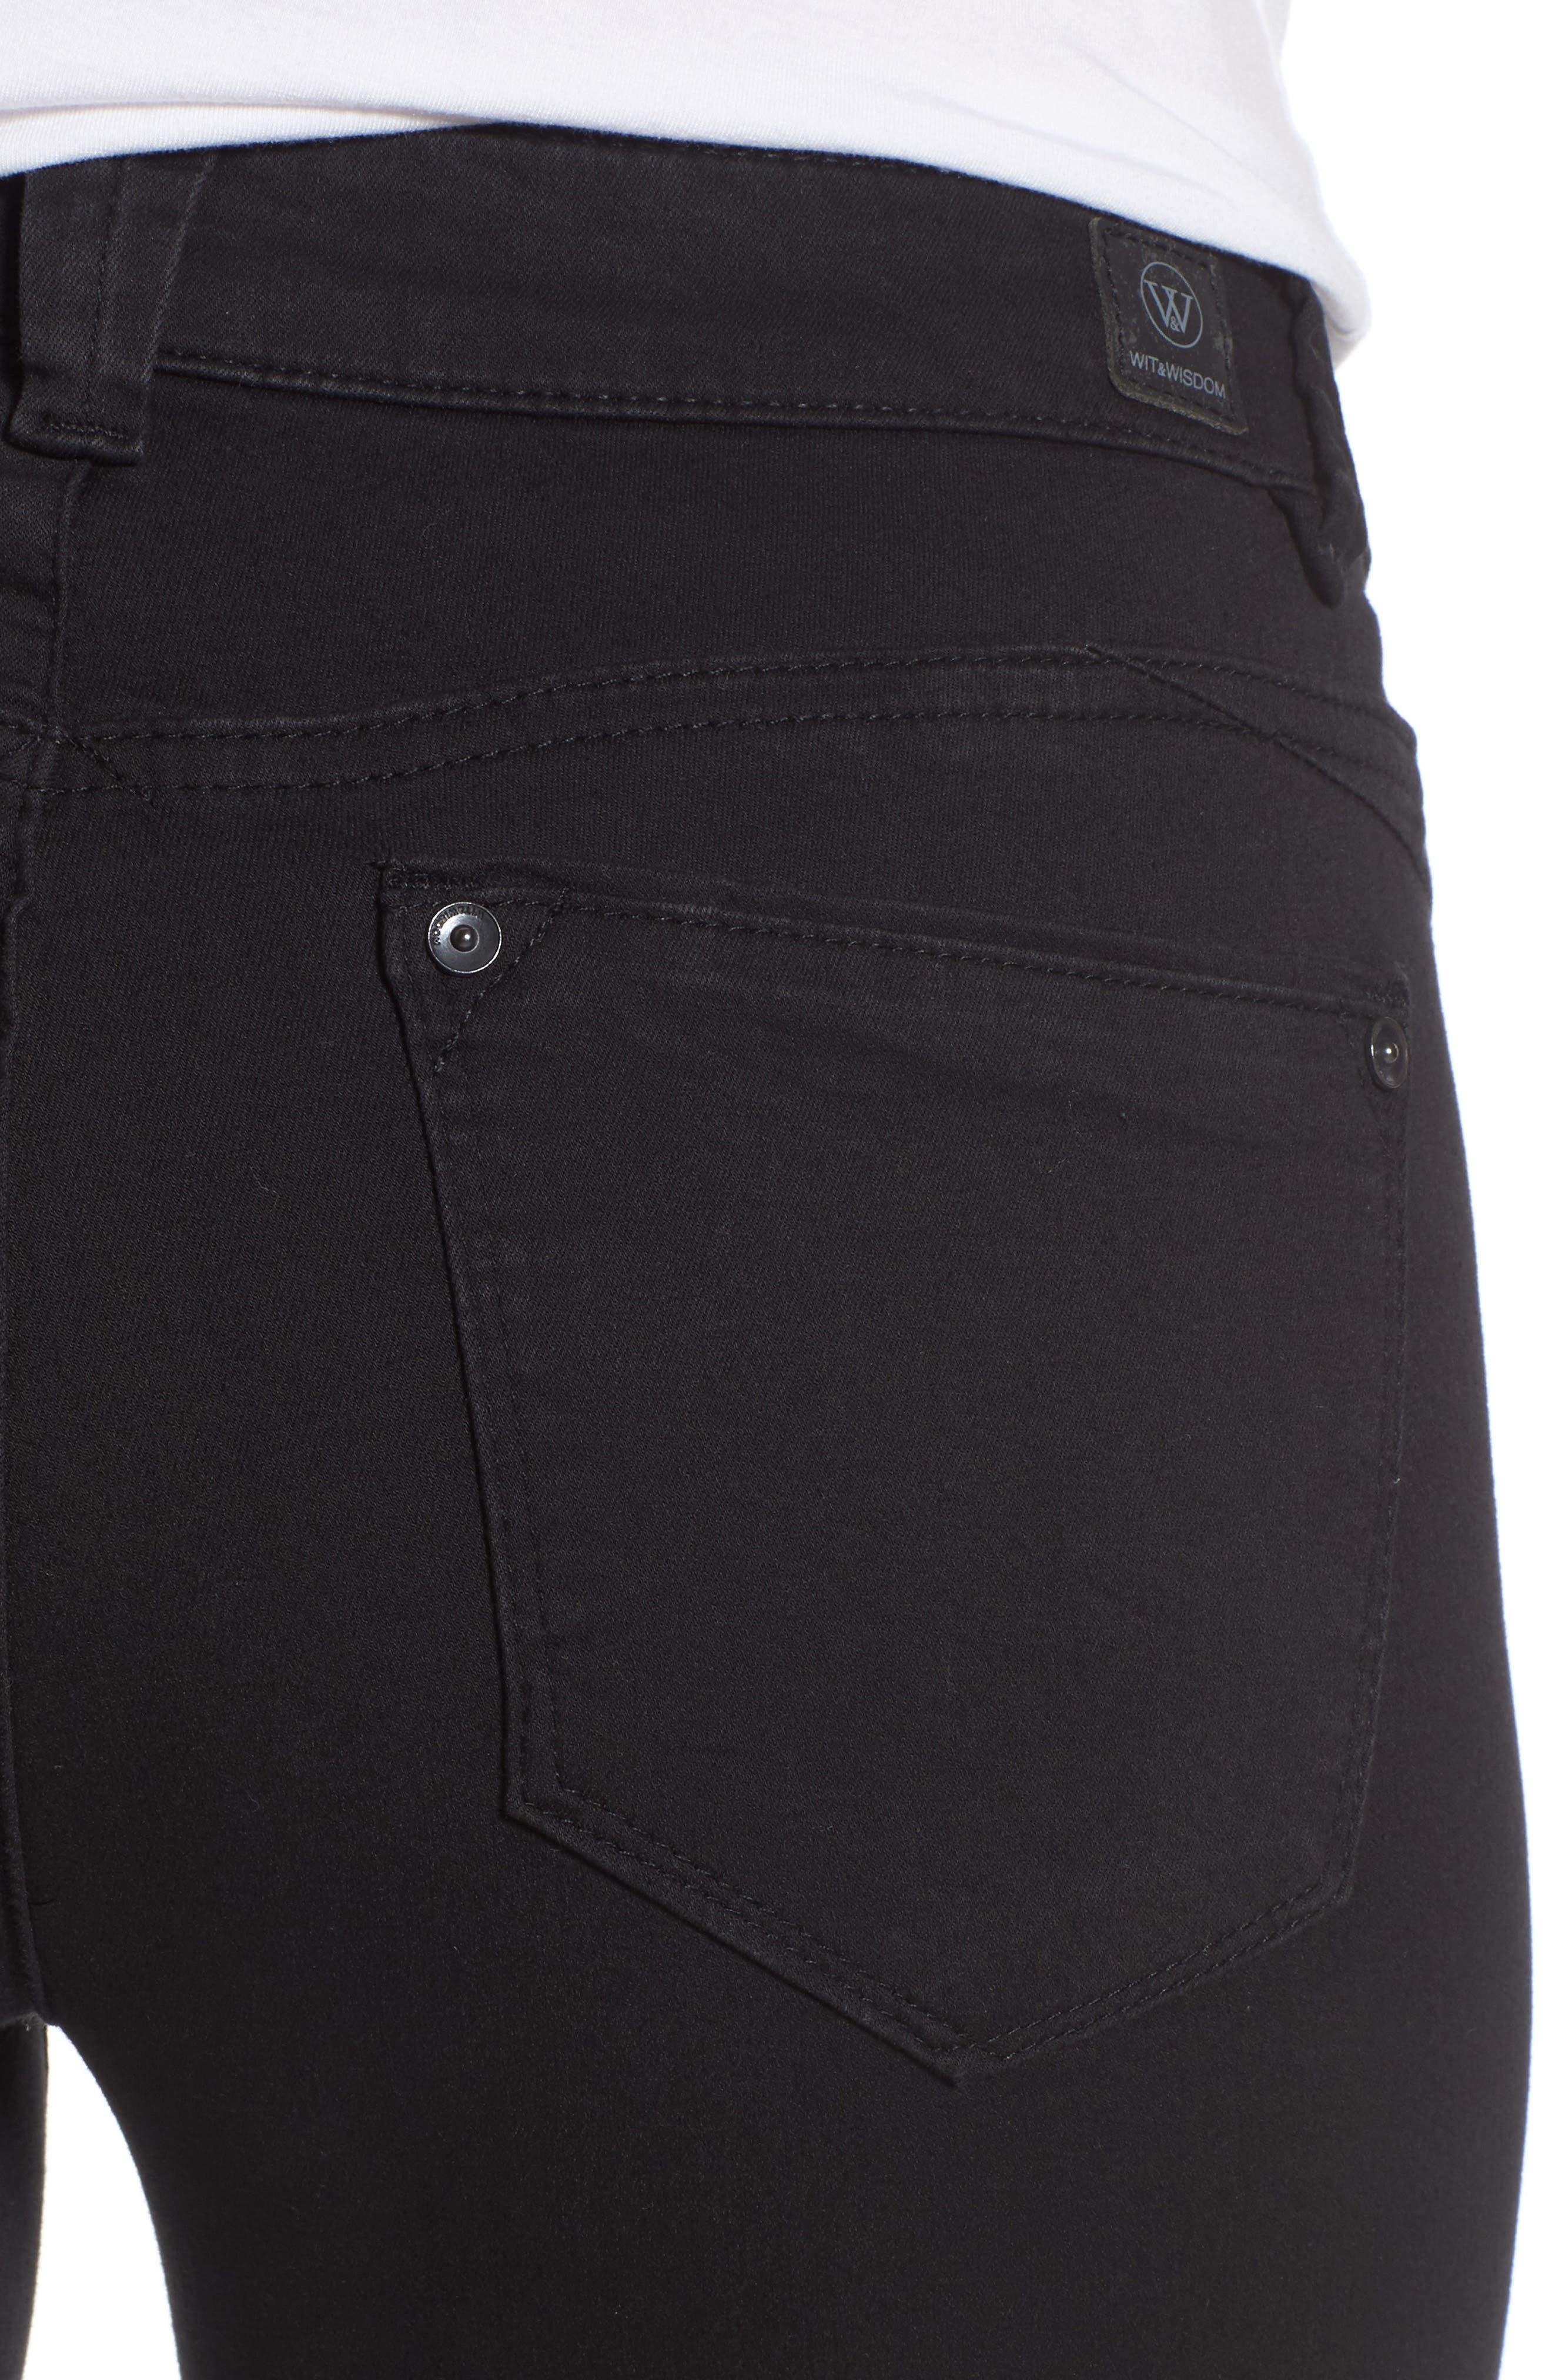 Alternate Image 4  - Wit & Wisdom Skinny Jeans (Nordstrom Exclusive) (Regular & Petite)